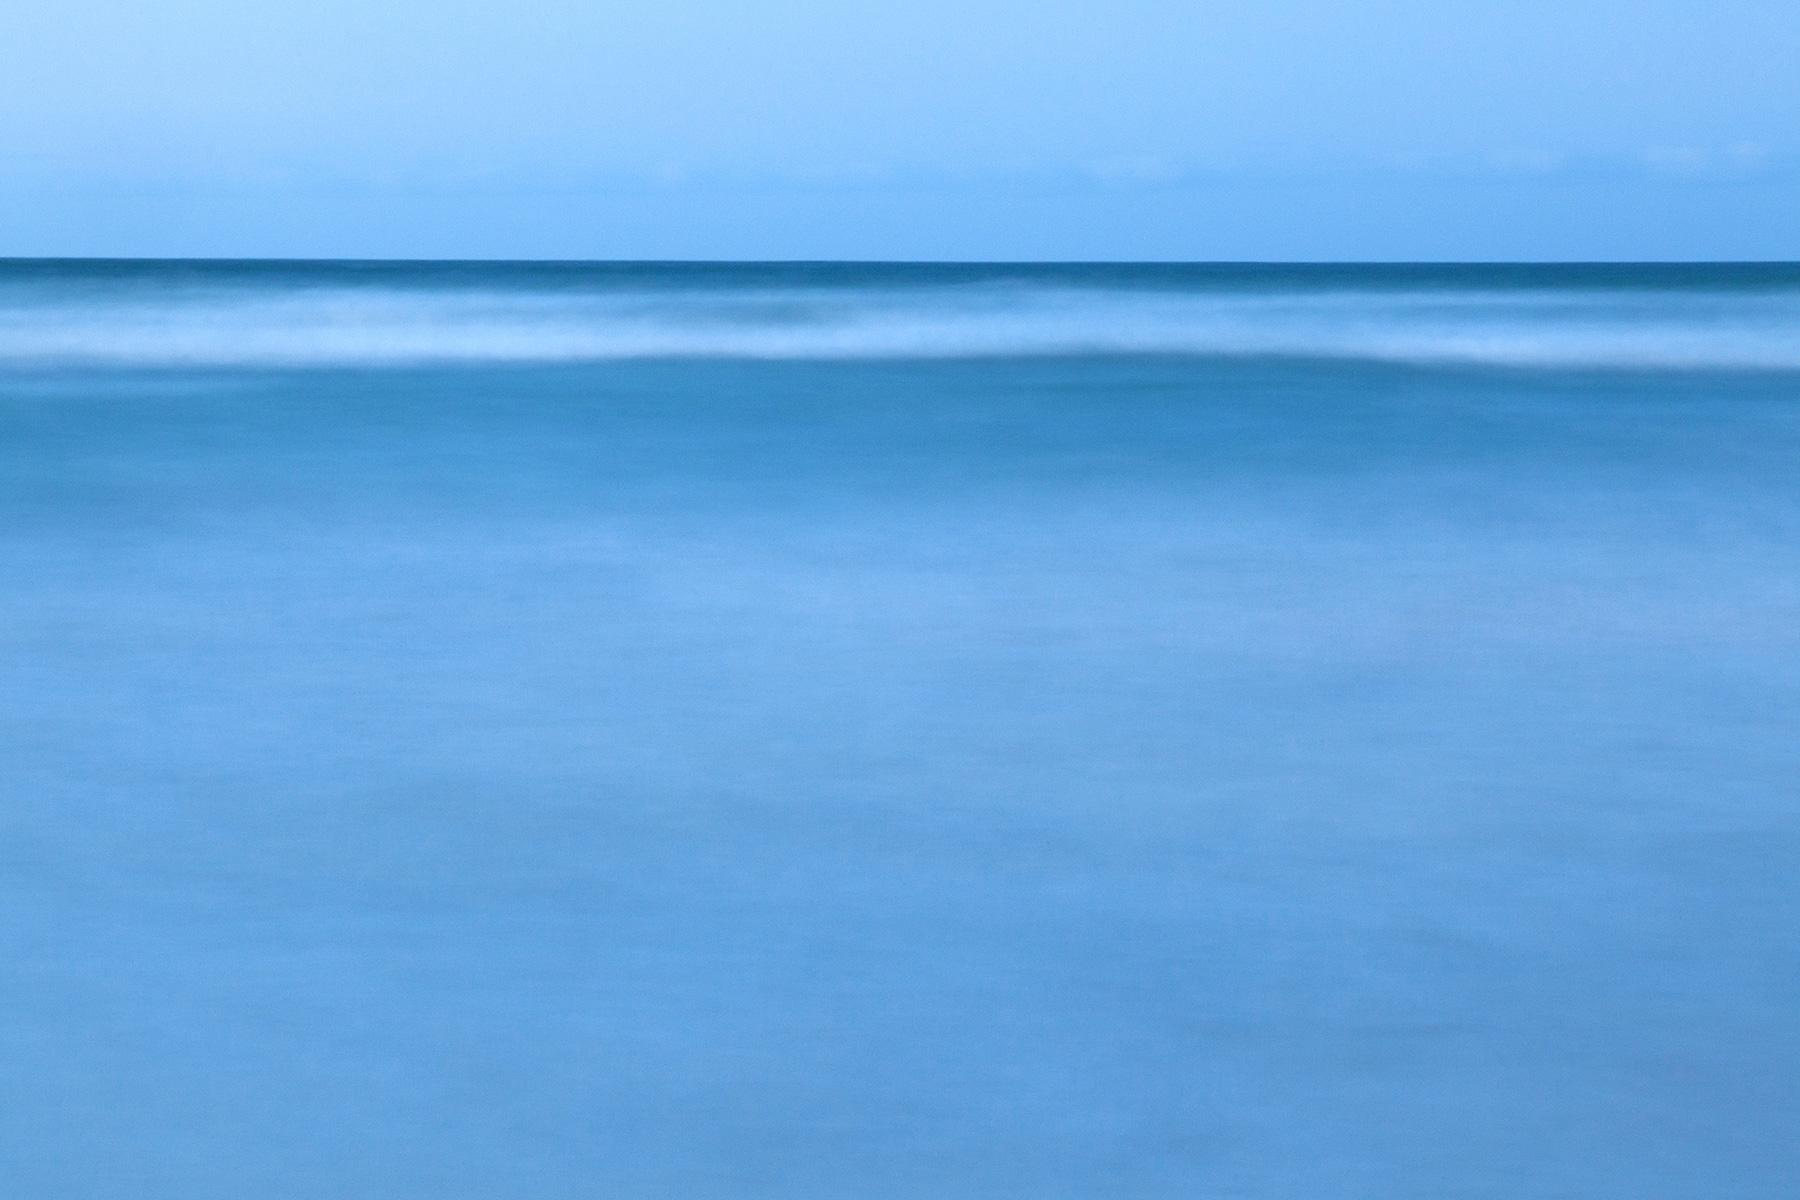 001-Seascape-1-120x90-cm-.jpg